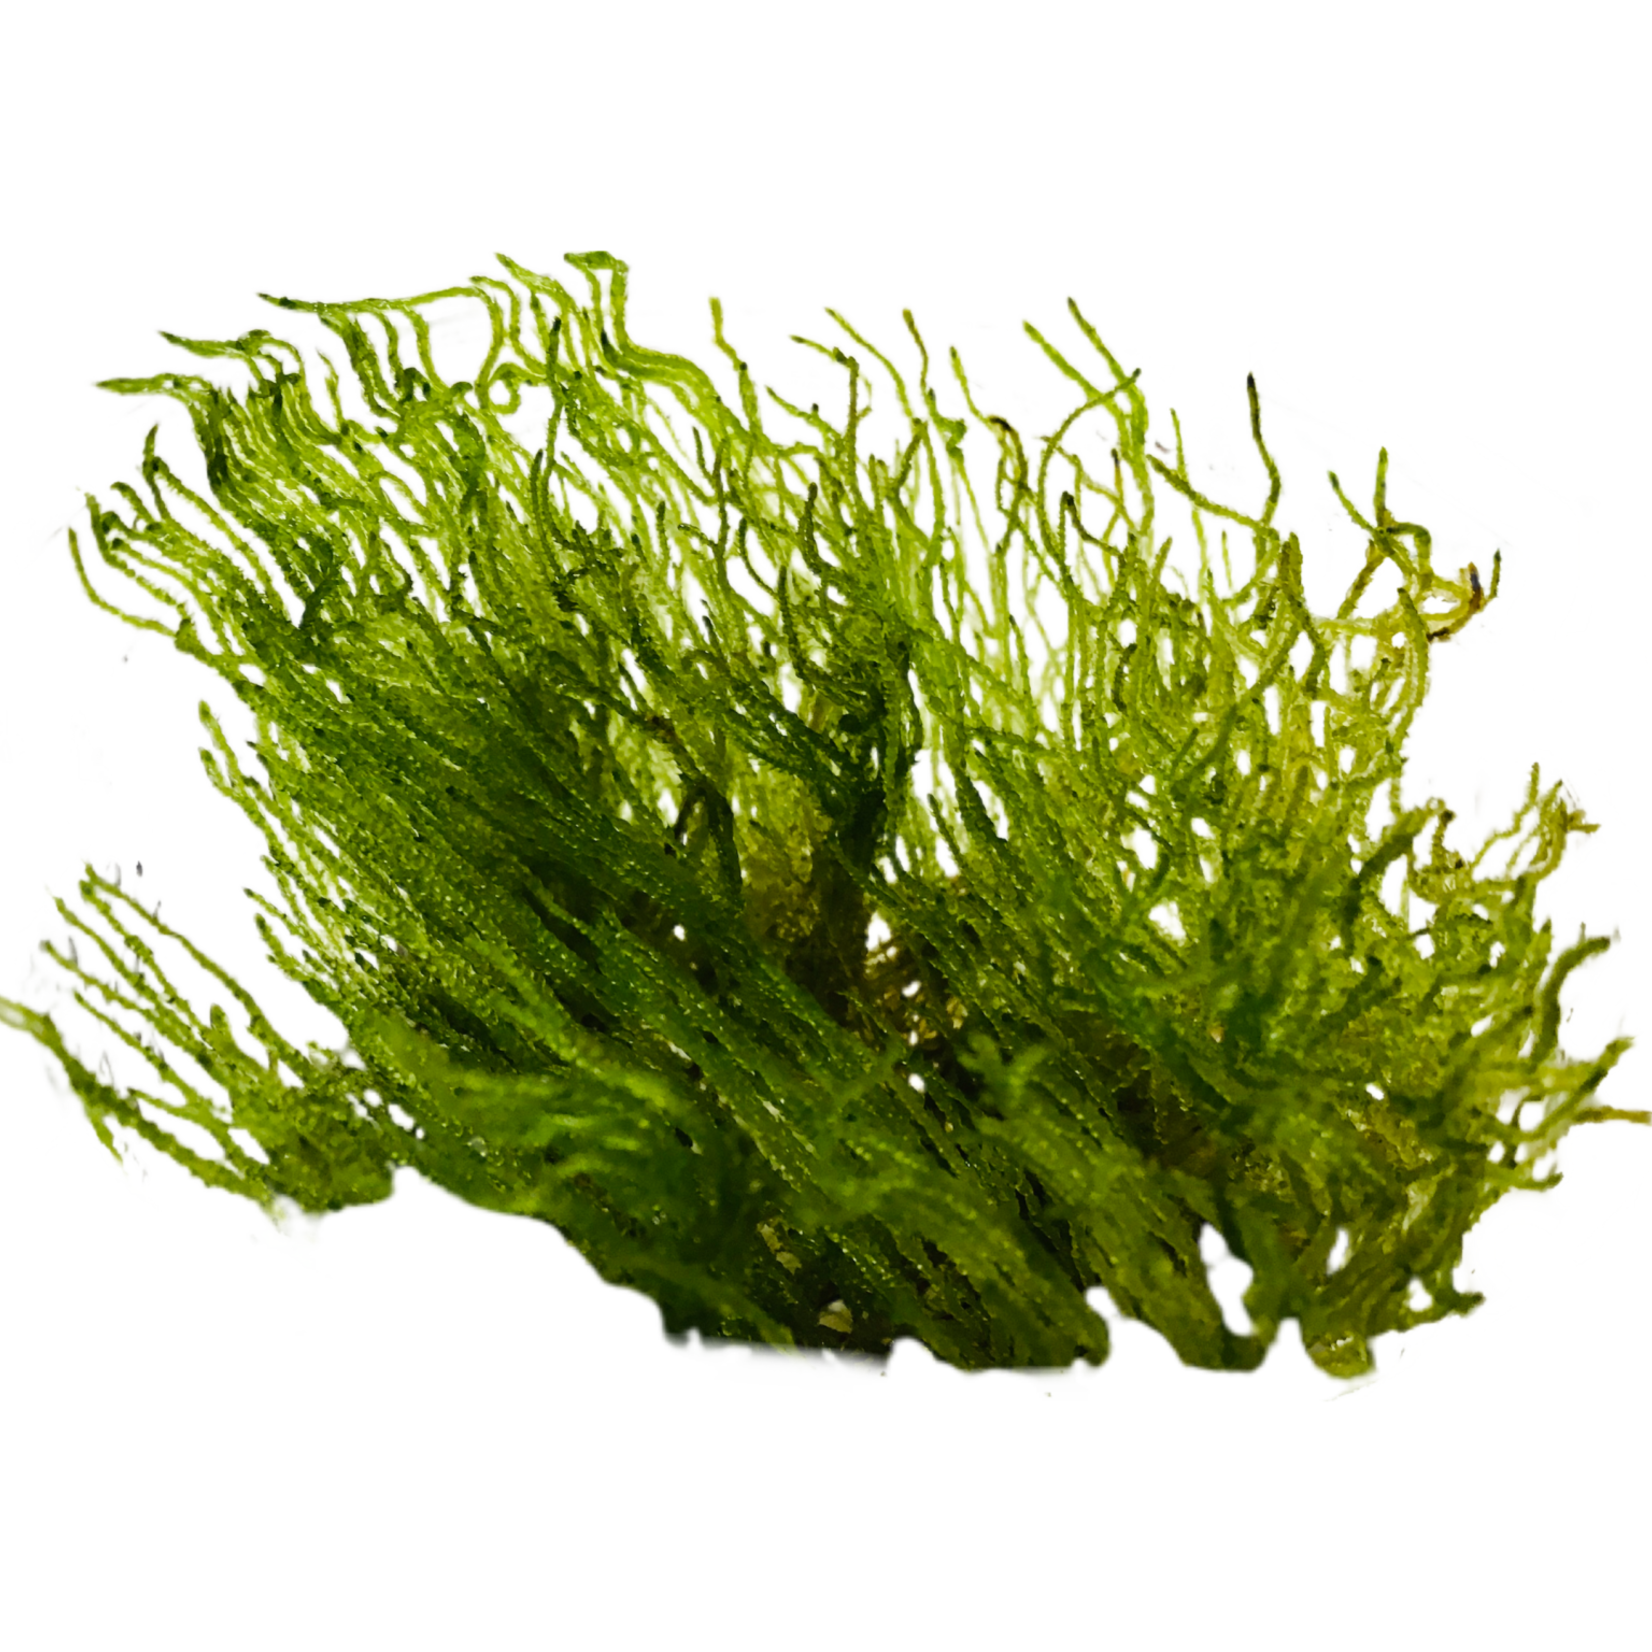 Mousse Vlammos (Taxiphyllum sp.)